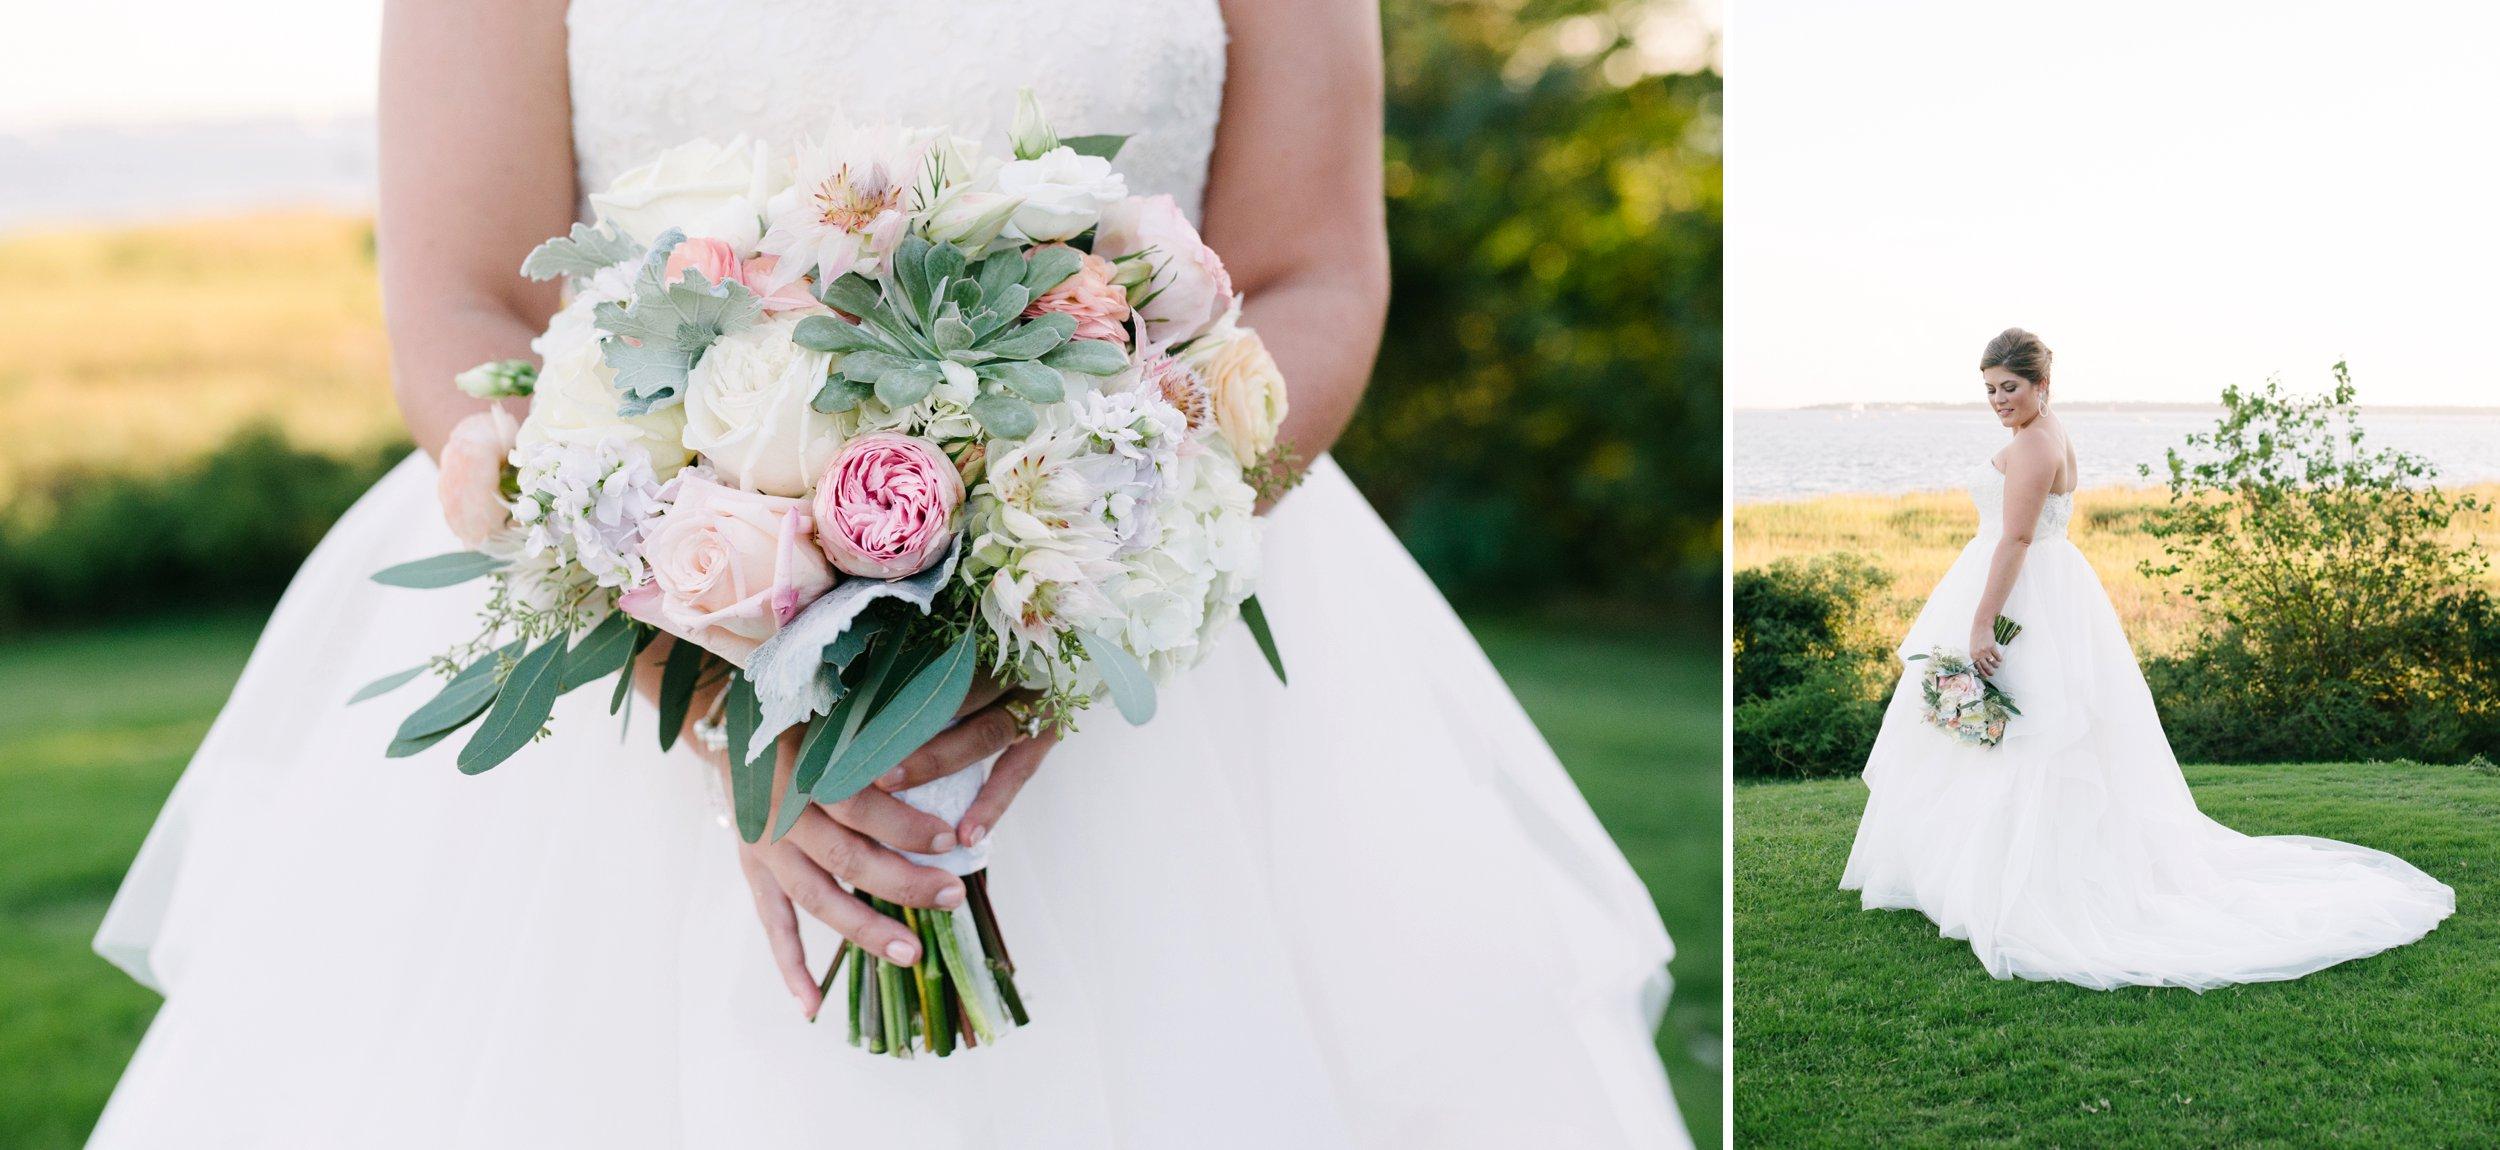 Charleston-wedding-photographer_0076.jpg